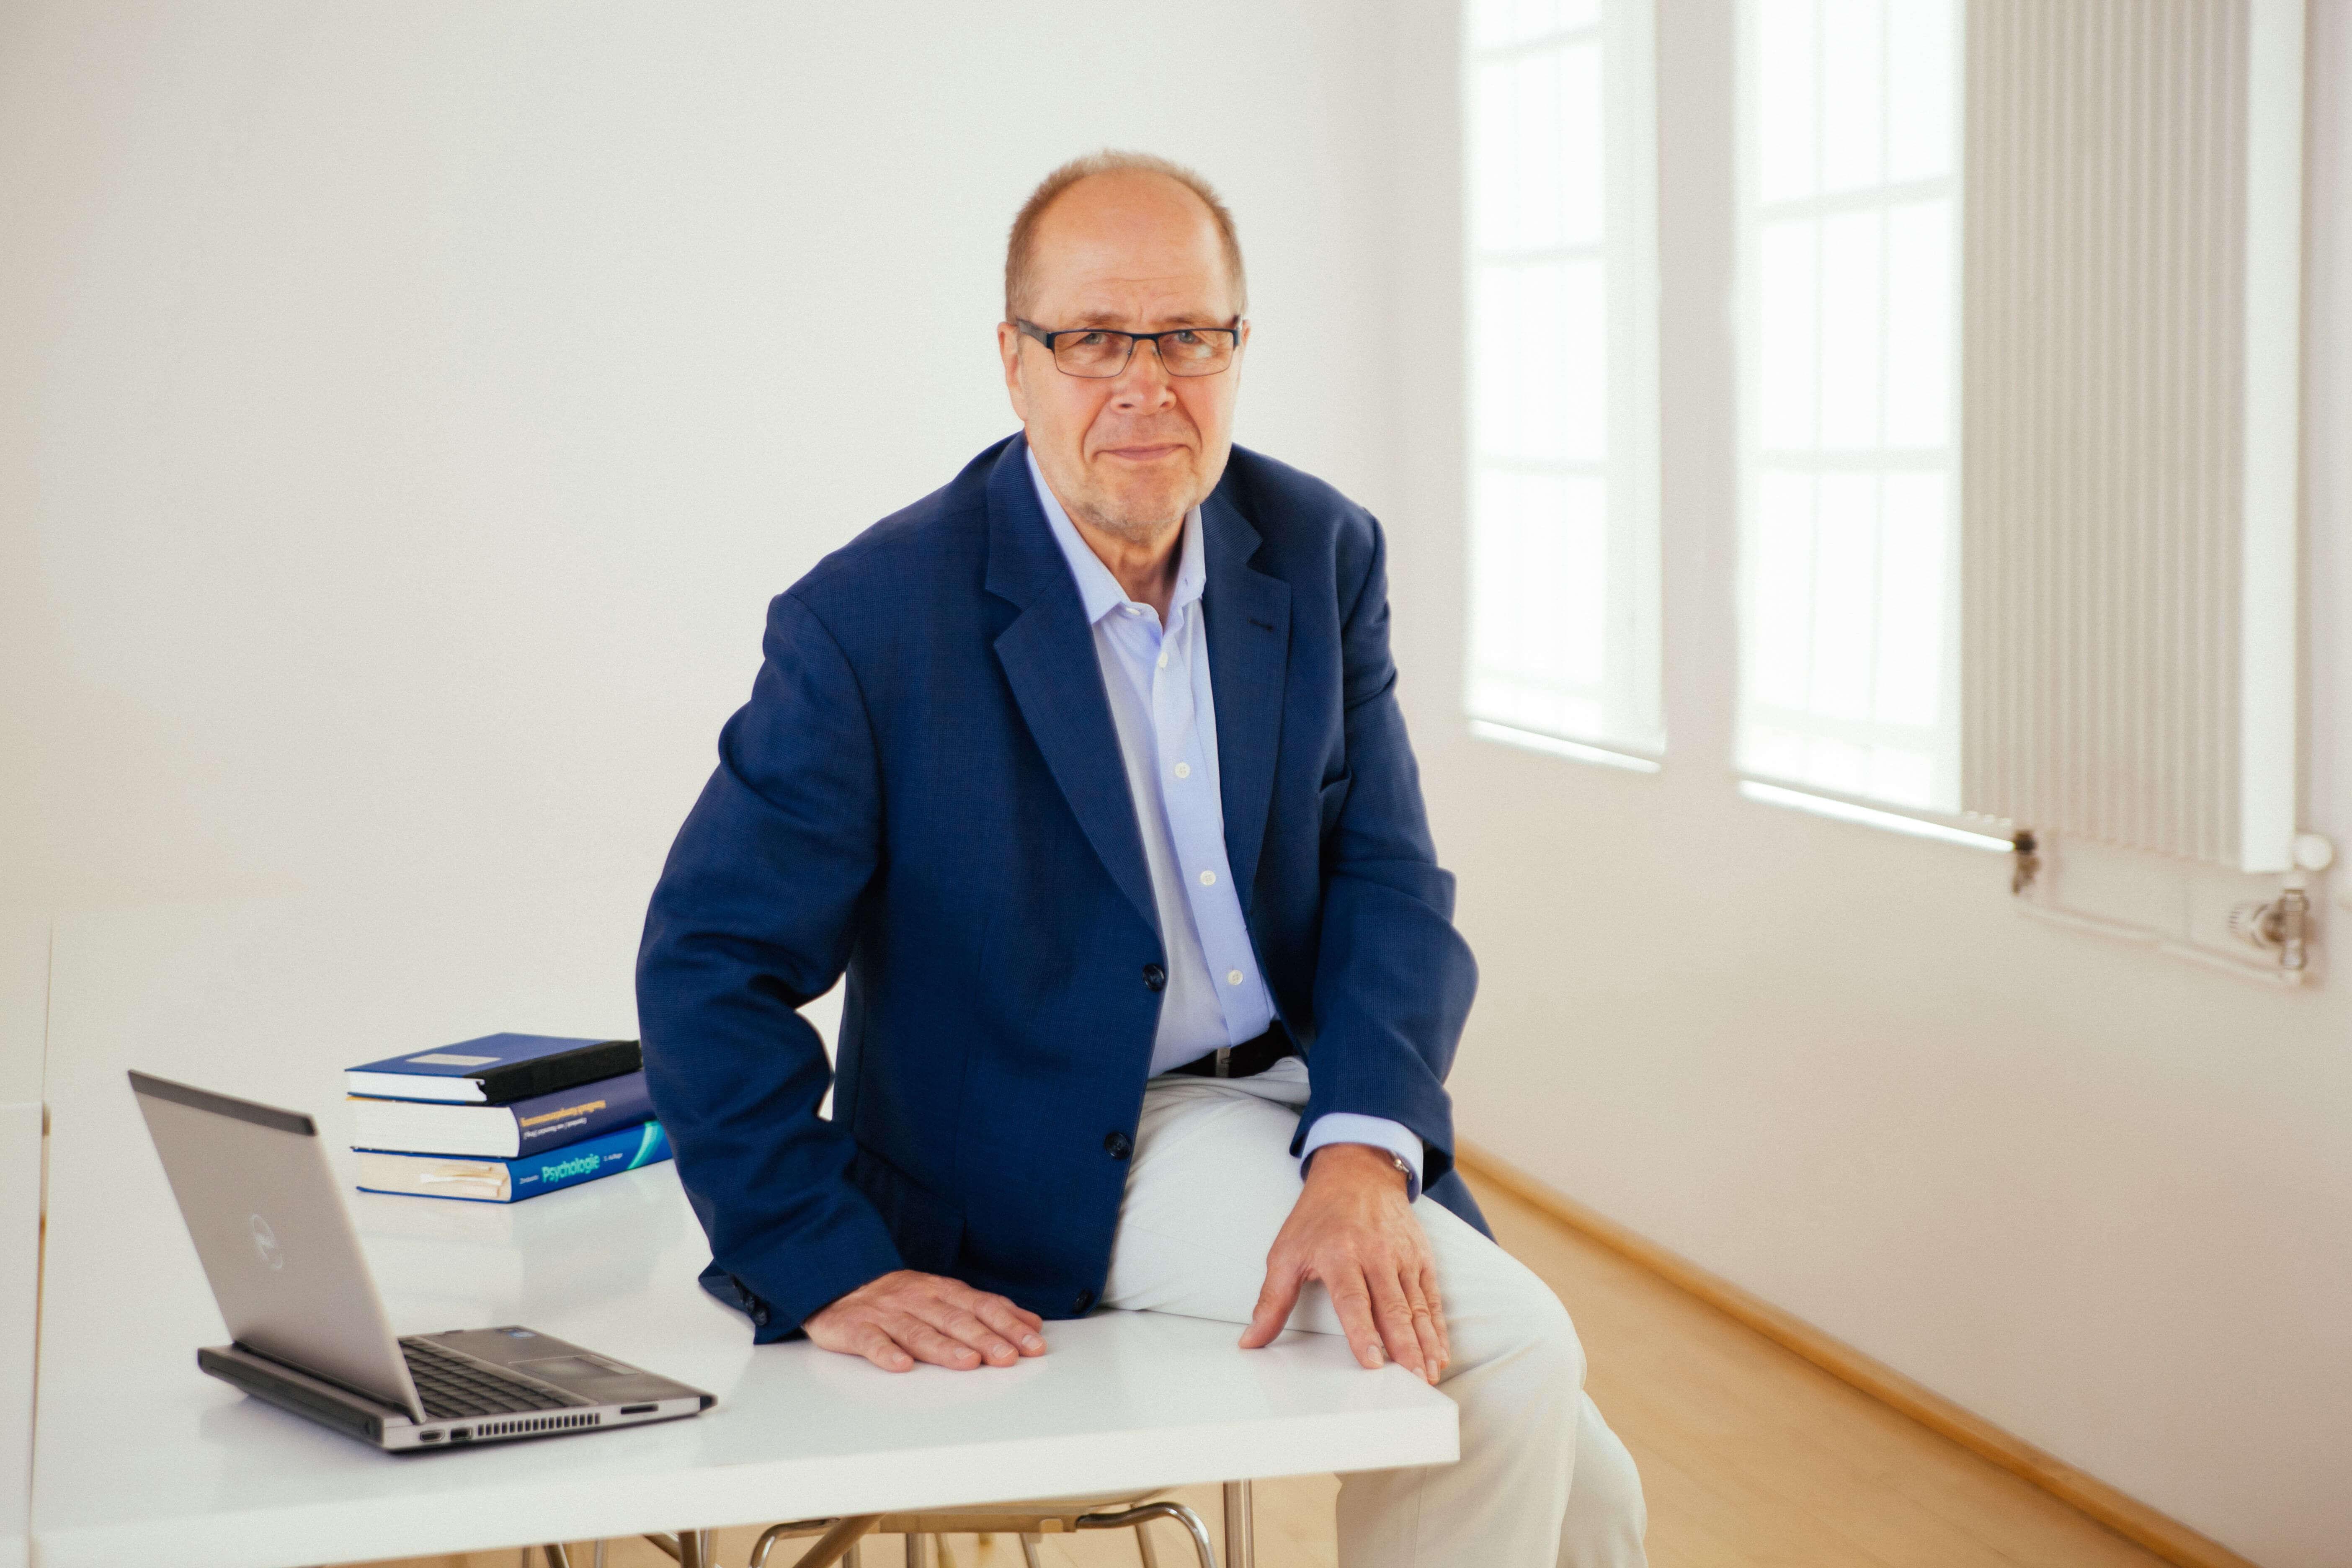 Personalberatung - Wolfgang Wagener